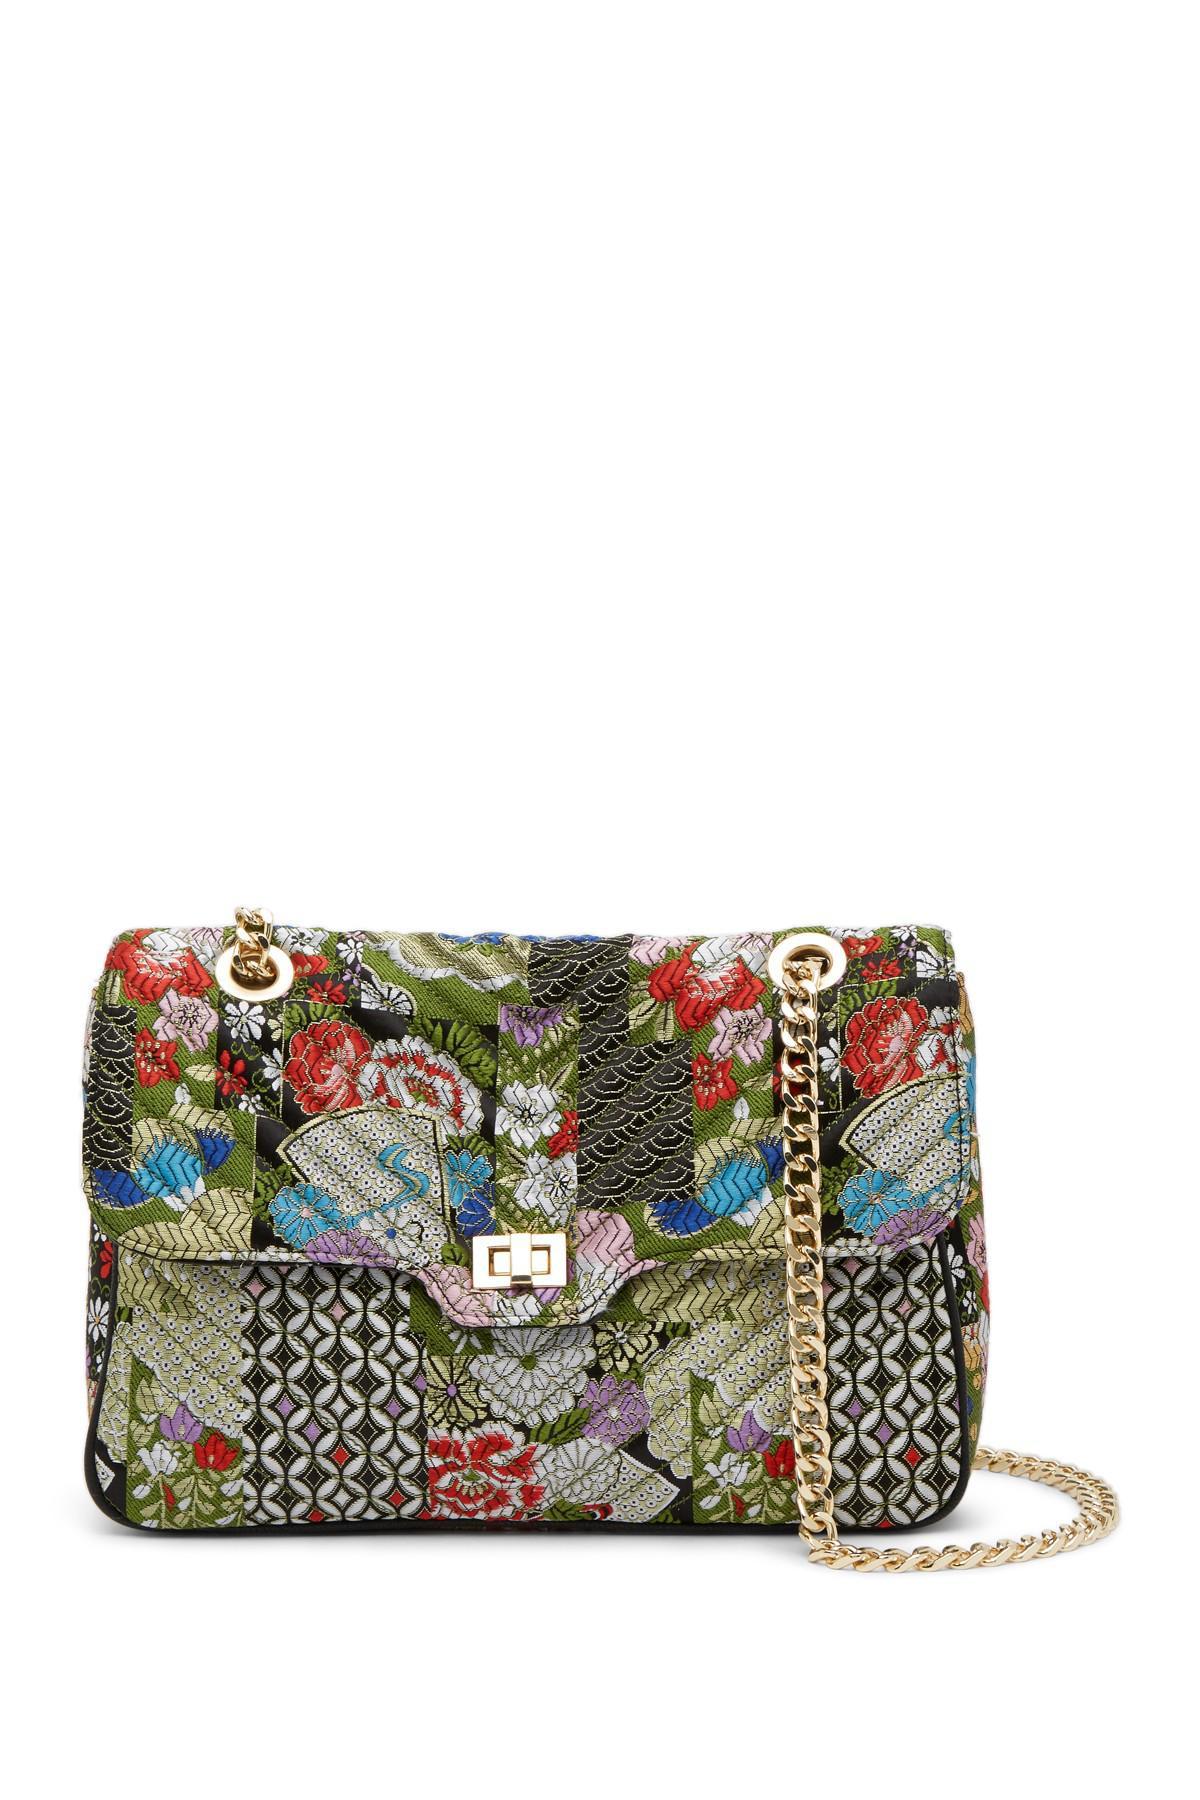 07aa42c7f28 Steve Madden Multicolor Ainsley Patchwork Brocade Convertible Shoulder Bag